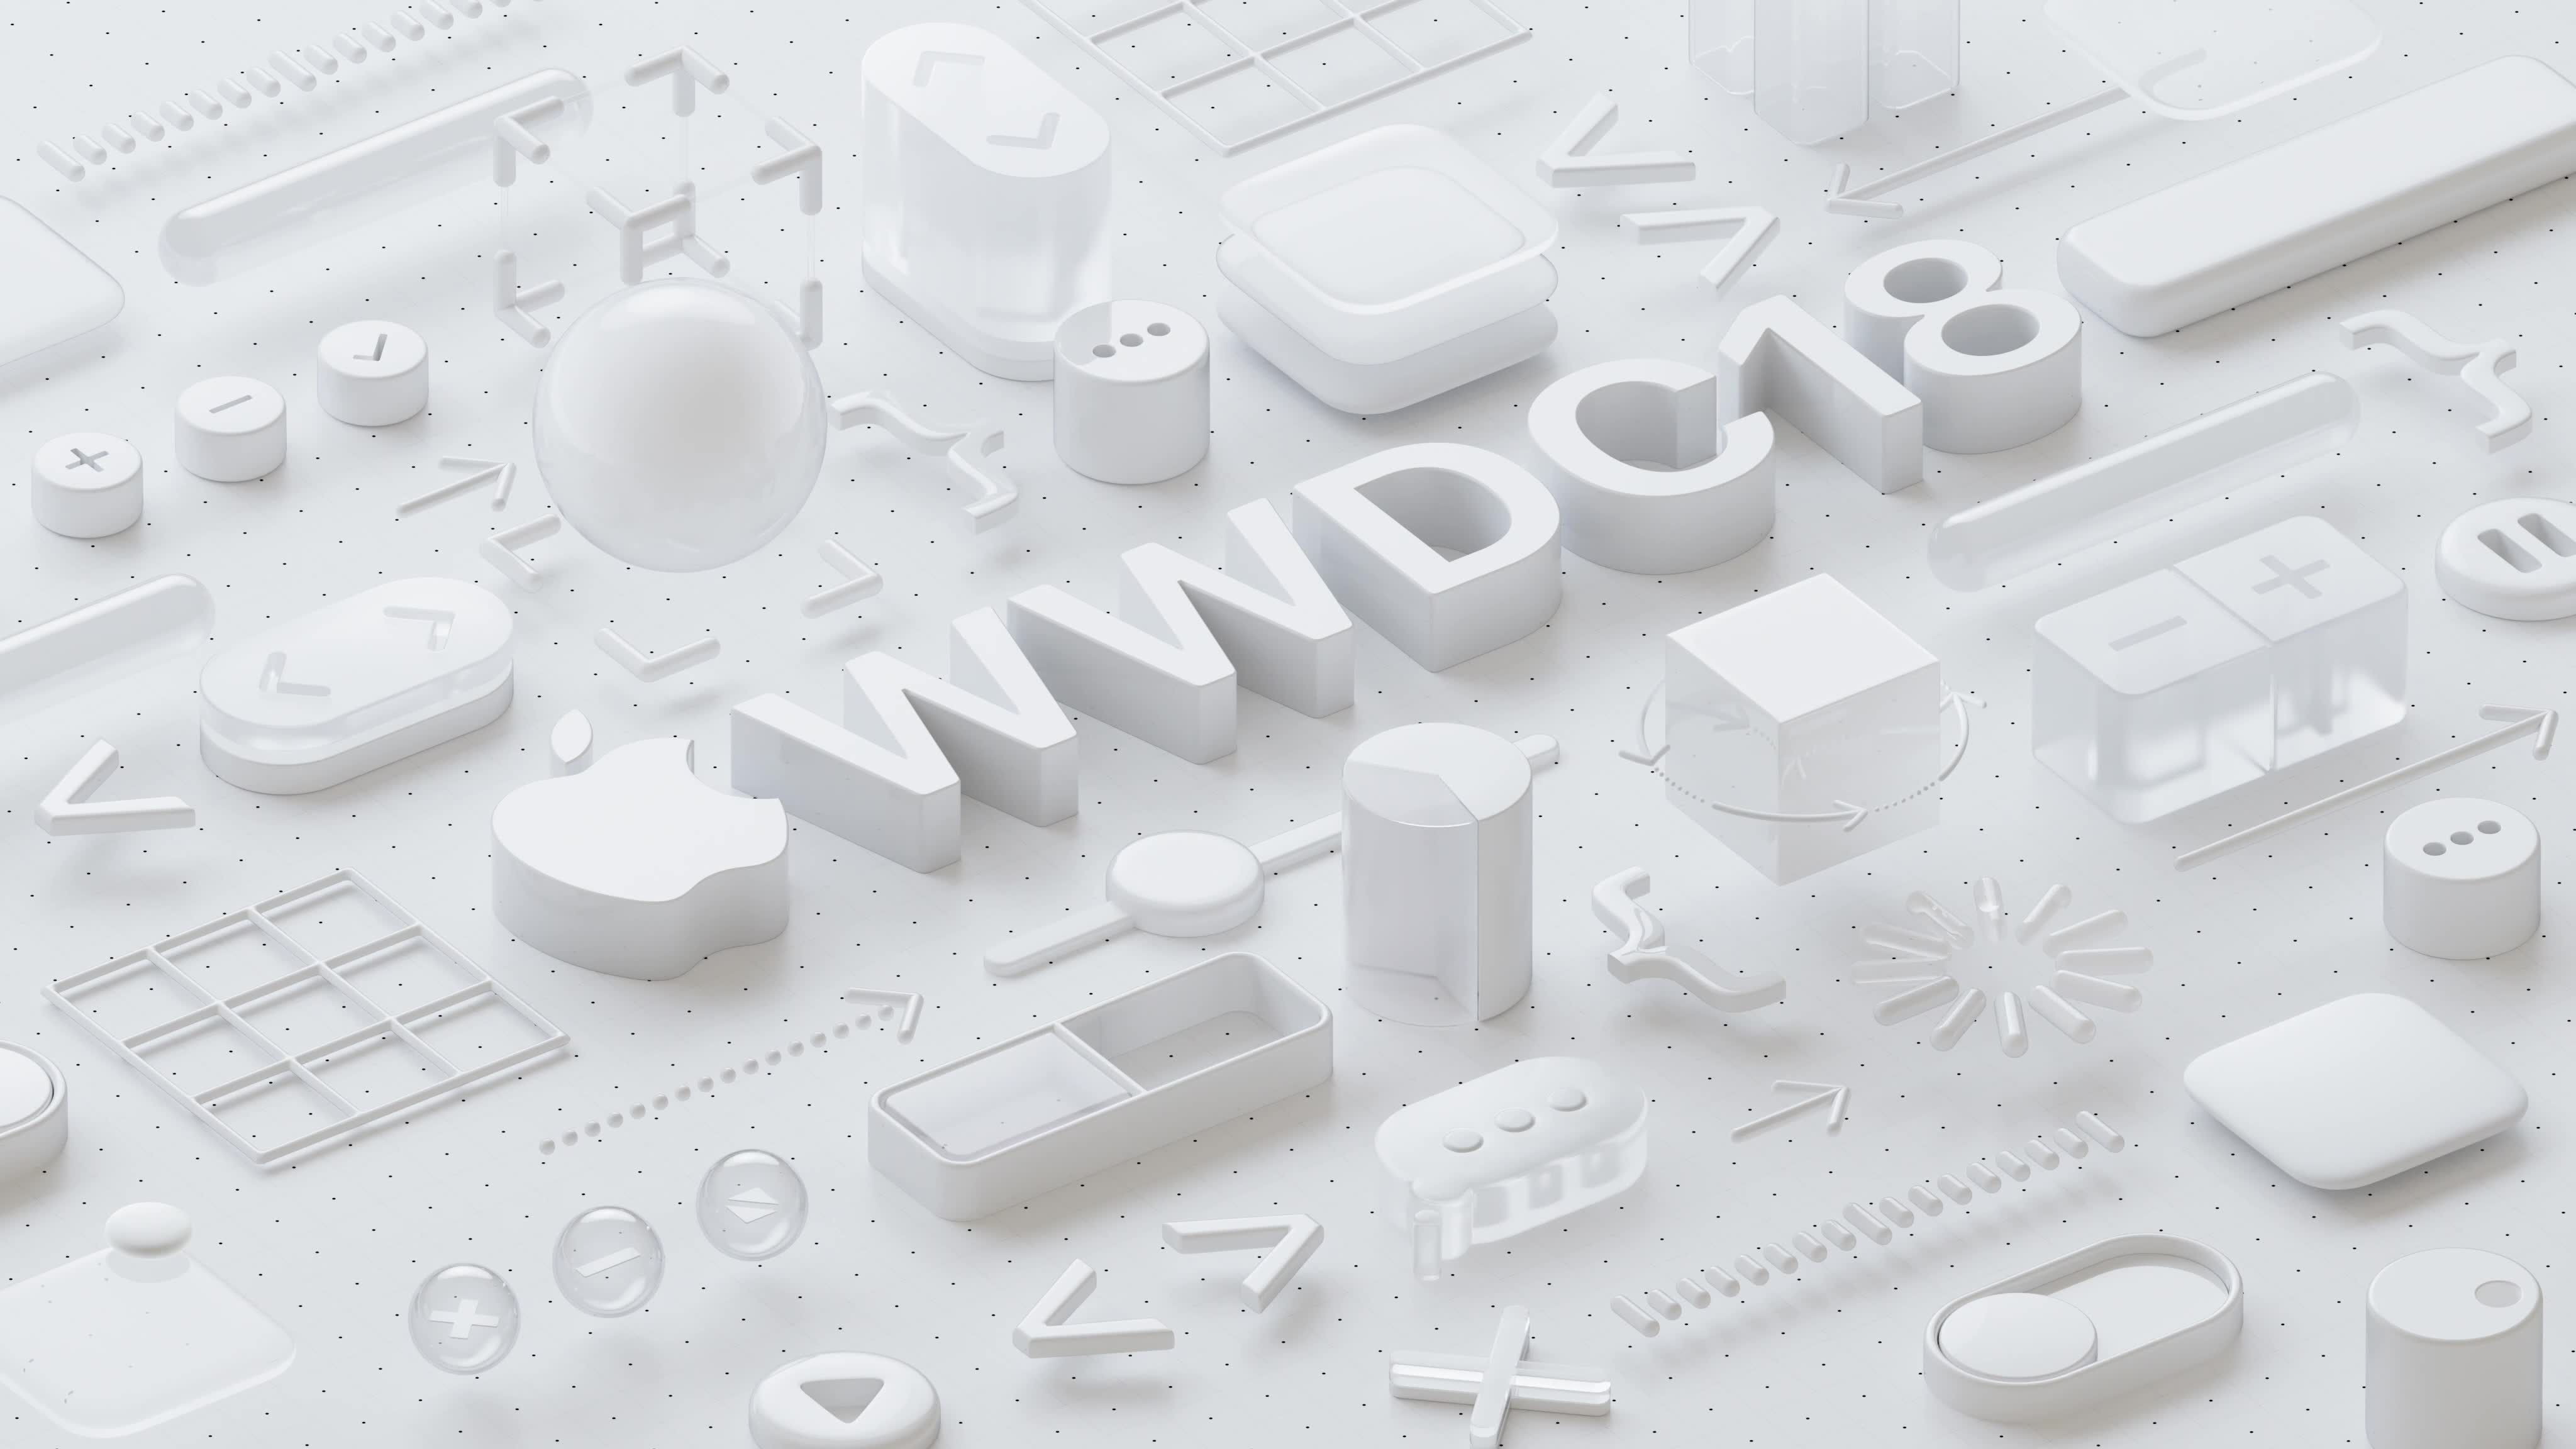 https://www.macfreak.nl/modules/news/images/zArt.WWDC2018.jpg